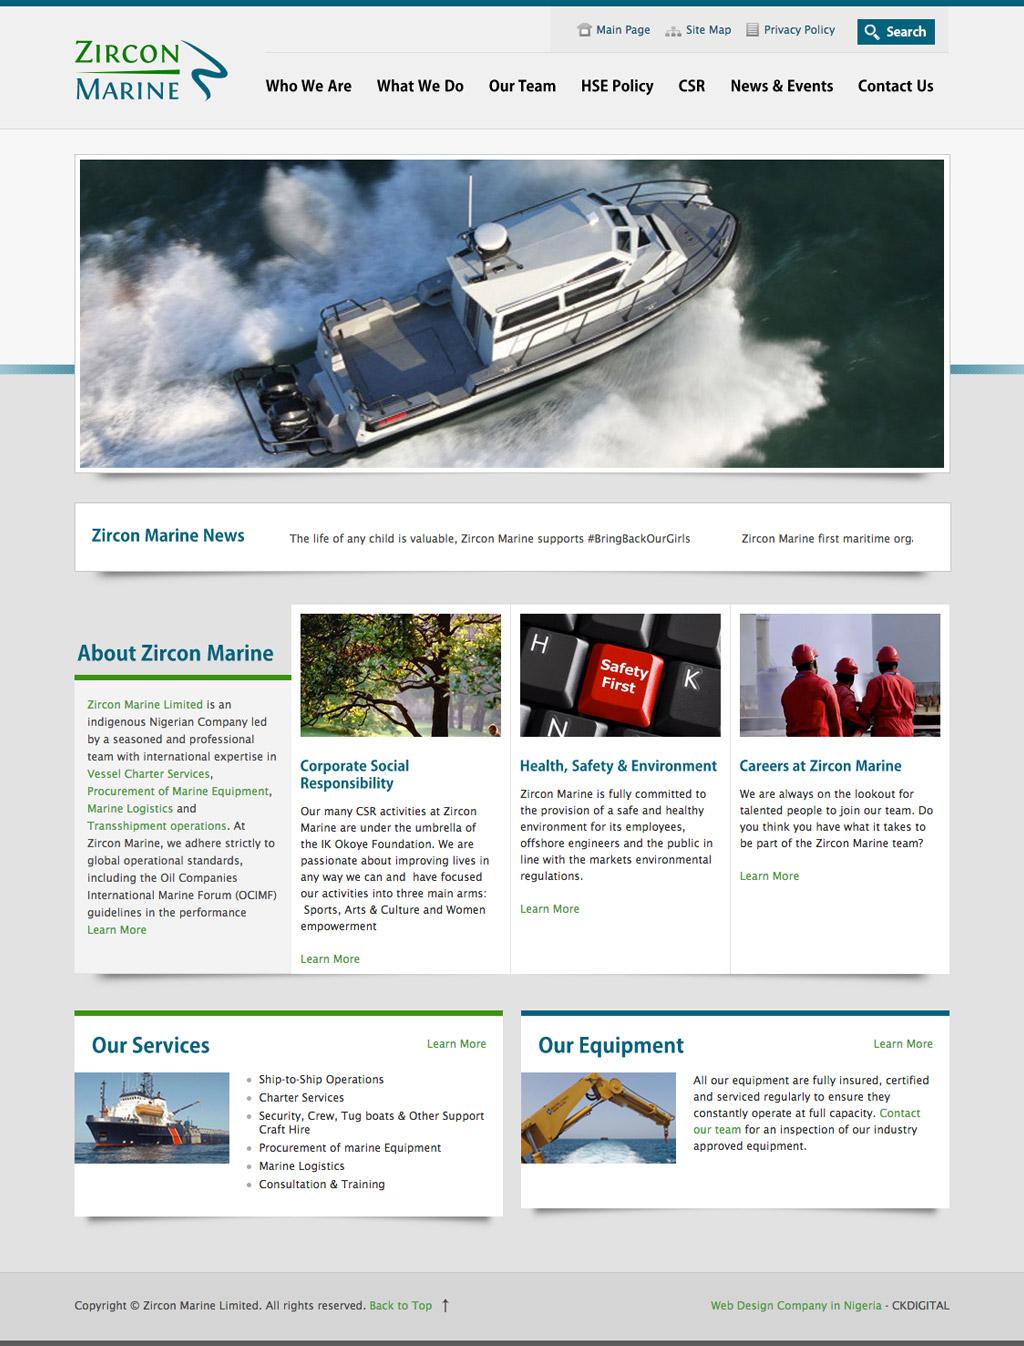 zircon-marine-website-design-homepage-development